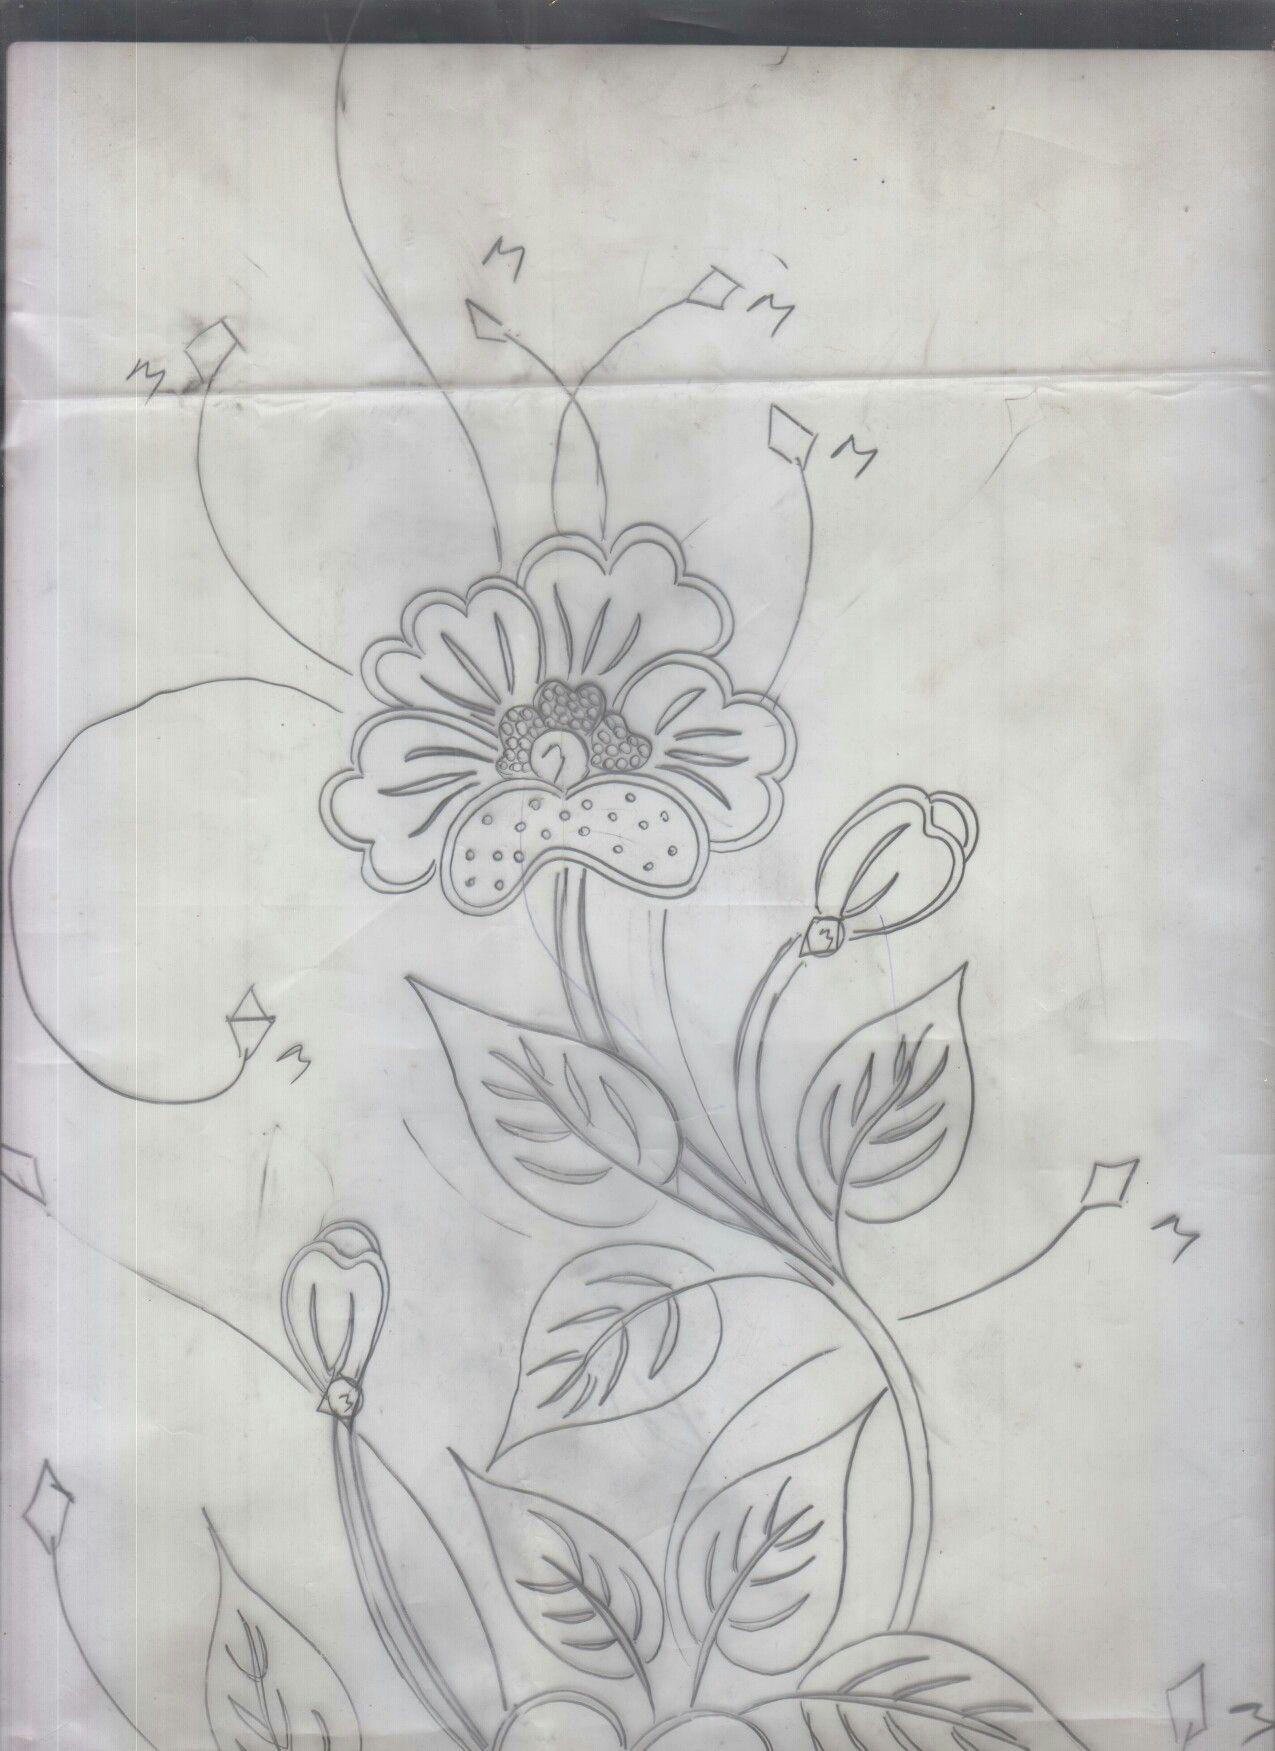 Pin By Baldev Gevariya On Design Sketches Pinterest Embroidery